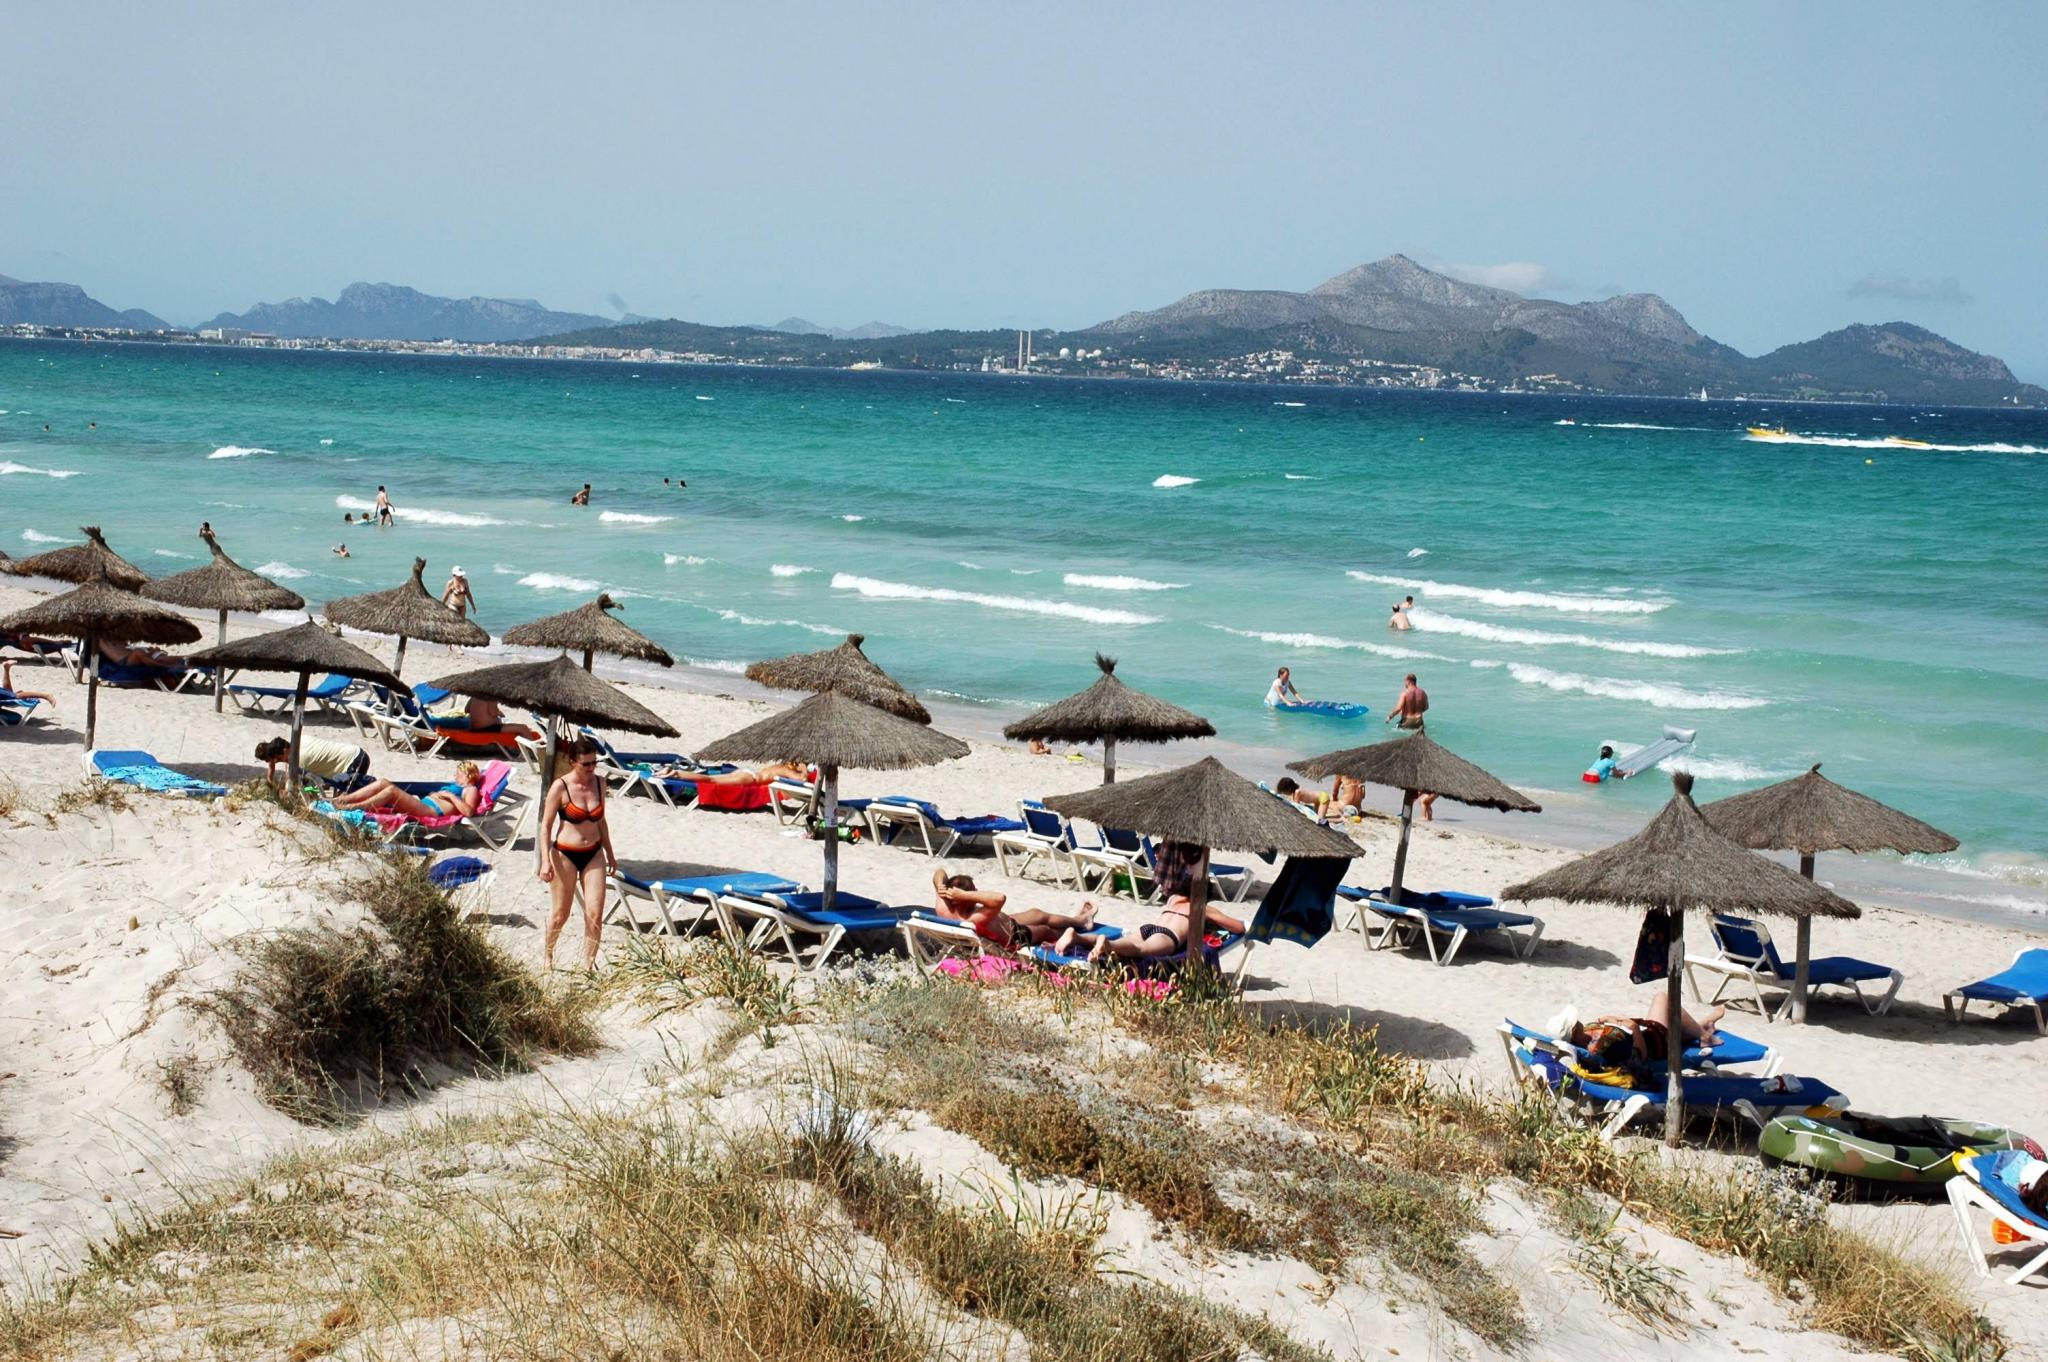 Playa De Muro Karte.Strande Calas Buchten Playa De Muro